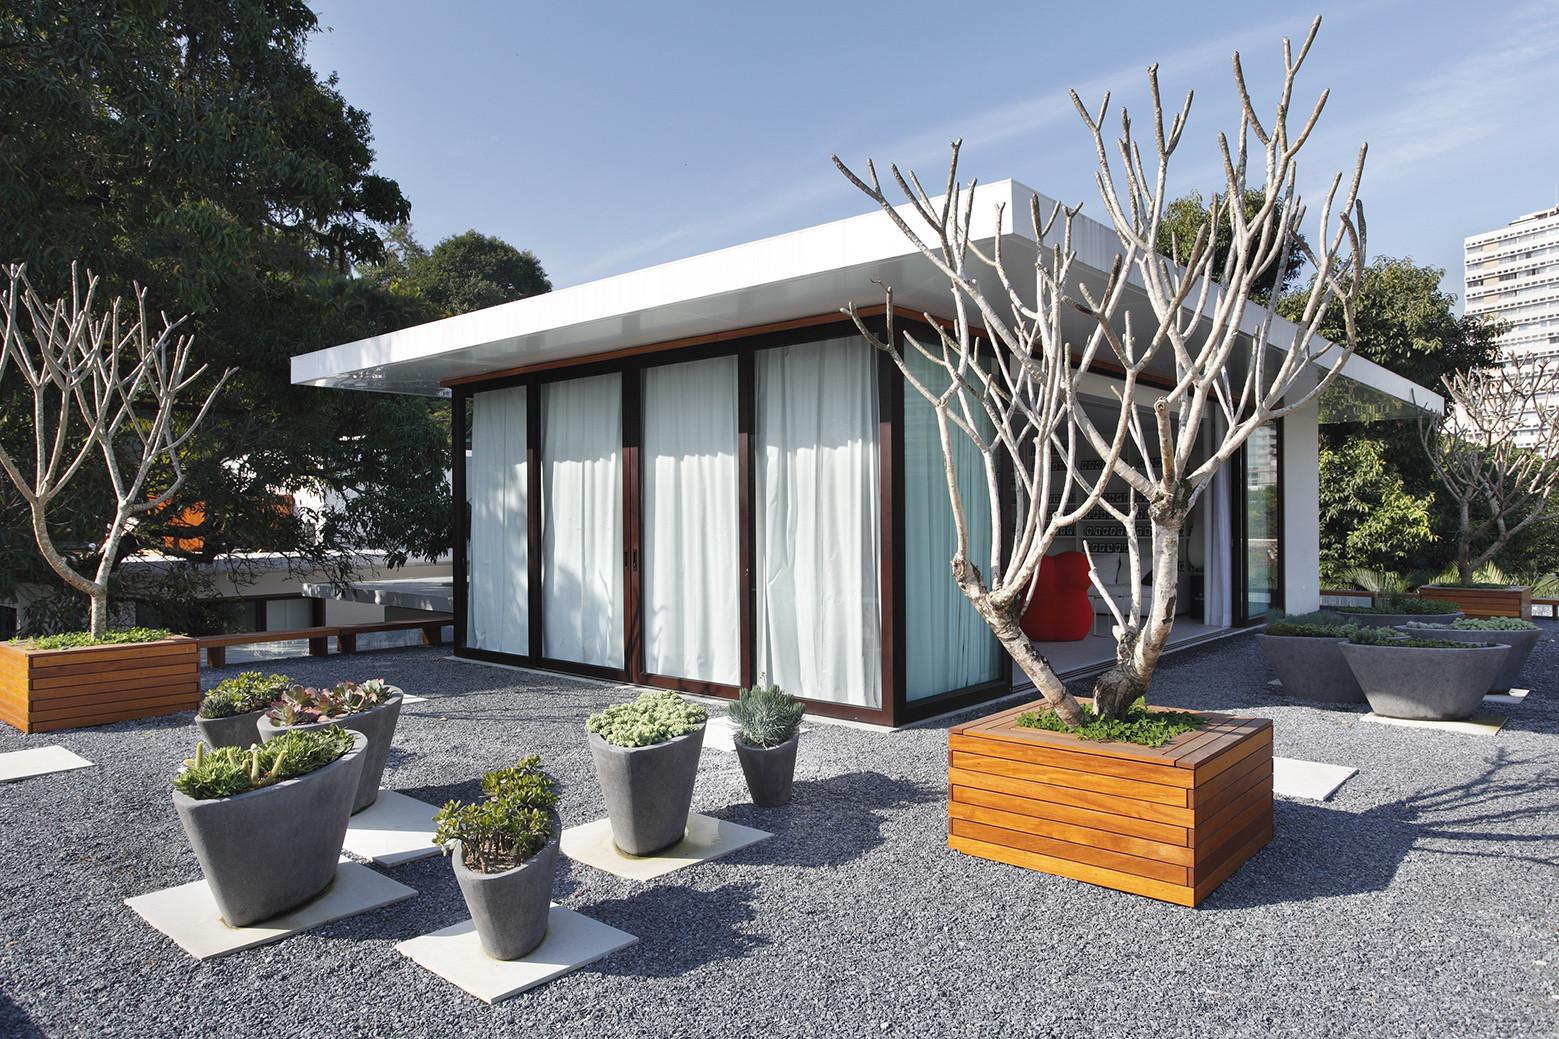 Tempo House / Gisele Taranto Arquitetura, © Denilson Machado - MCA Estudio